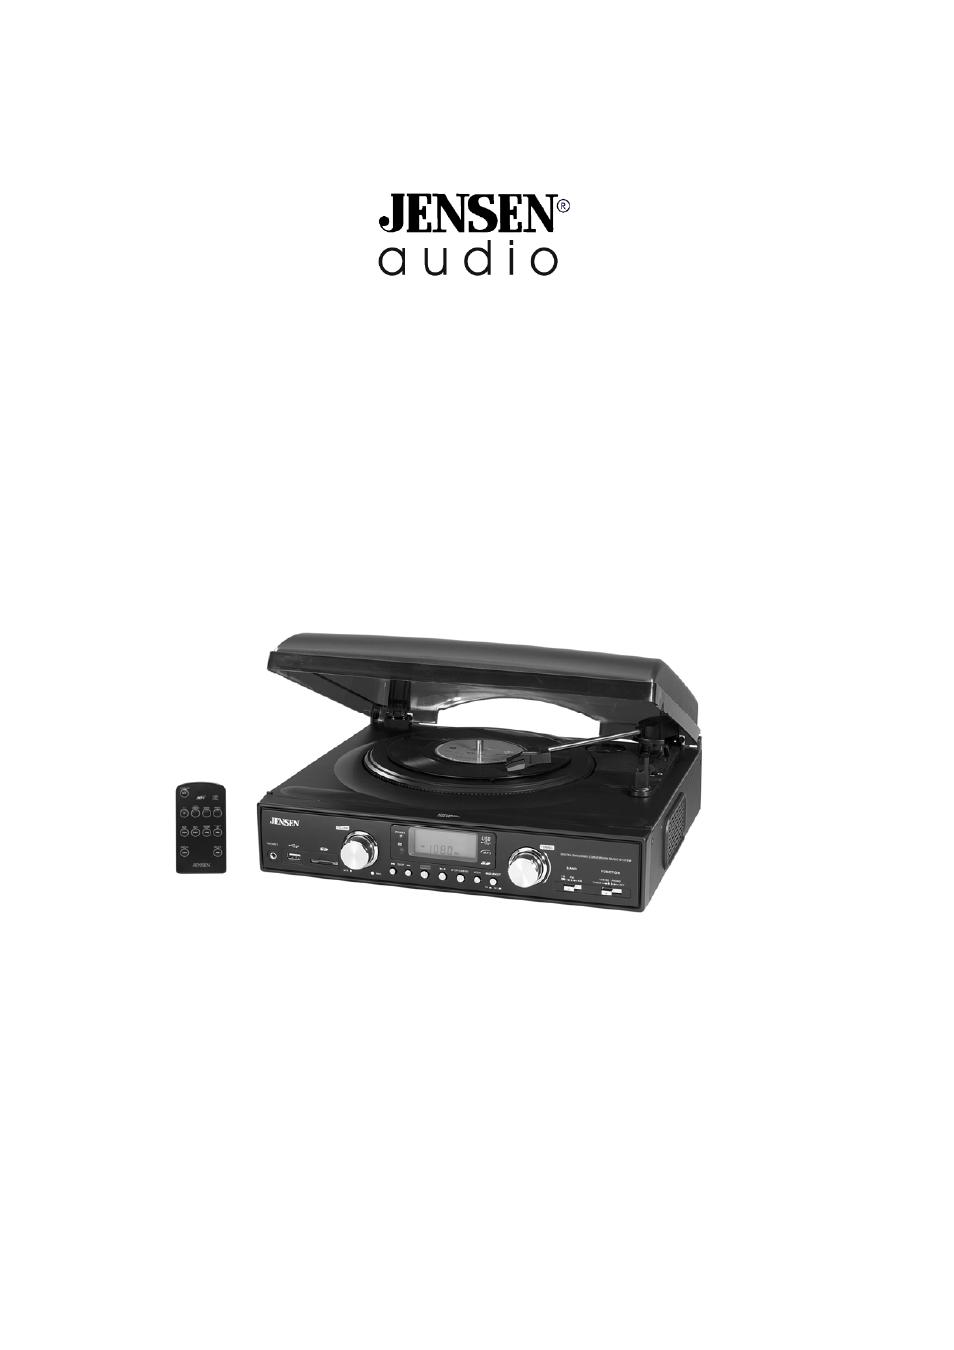 jensen jta 450 user manual 16 pages original mode rh manualsdir com Jensen System Mini Jensen Amplifier